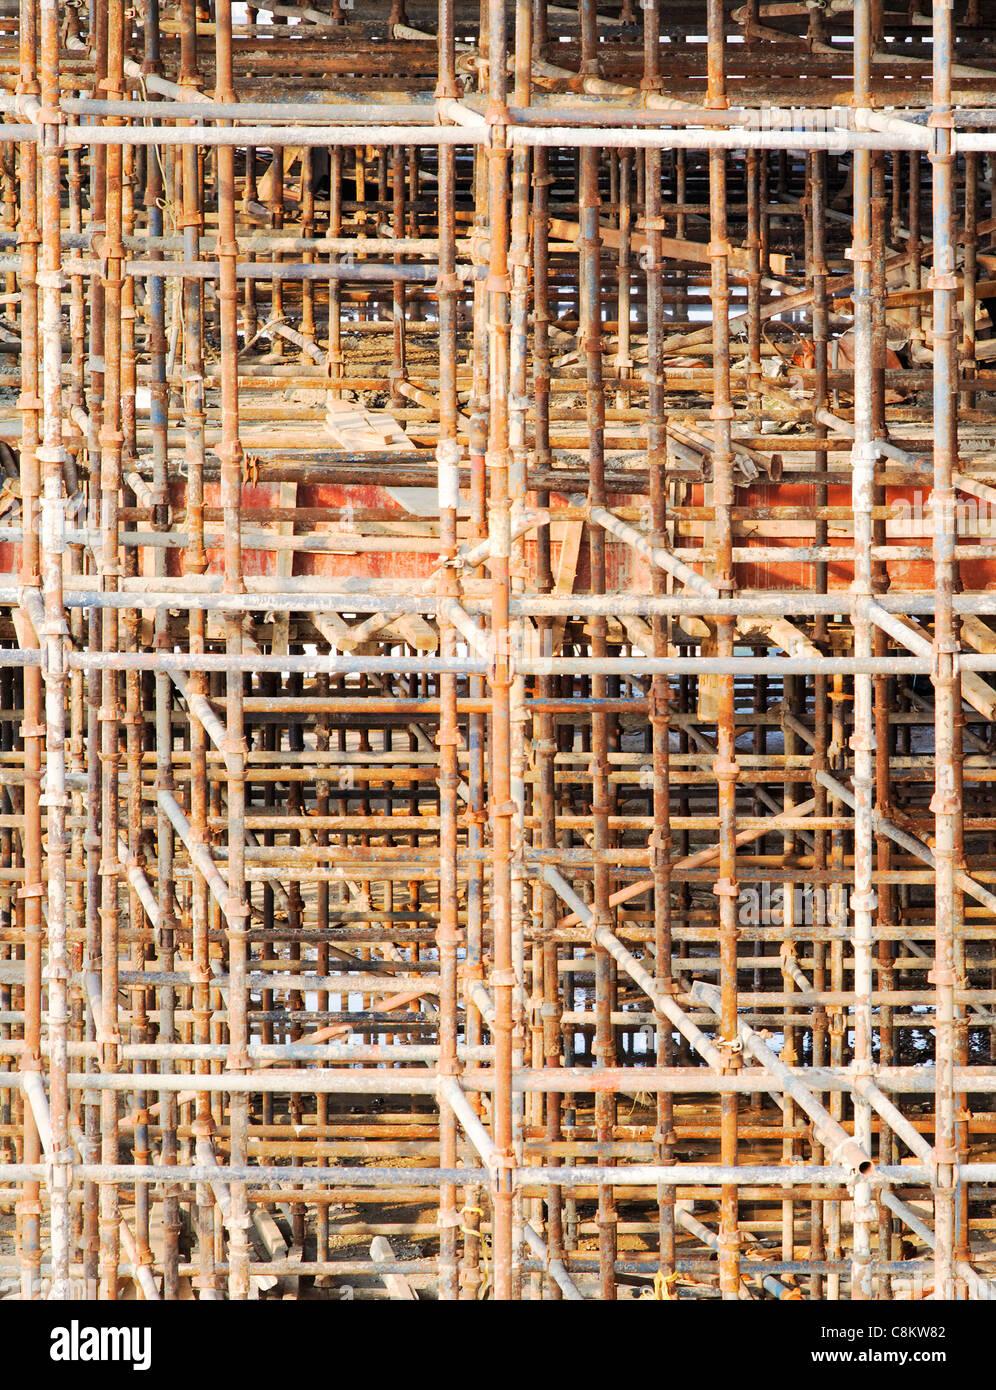 vertical portrait rusty scaffold scaffolding erection at n stock photo vertical portrait rusty scaffold scaffolding erection at n construction builder development crop margins texture background